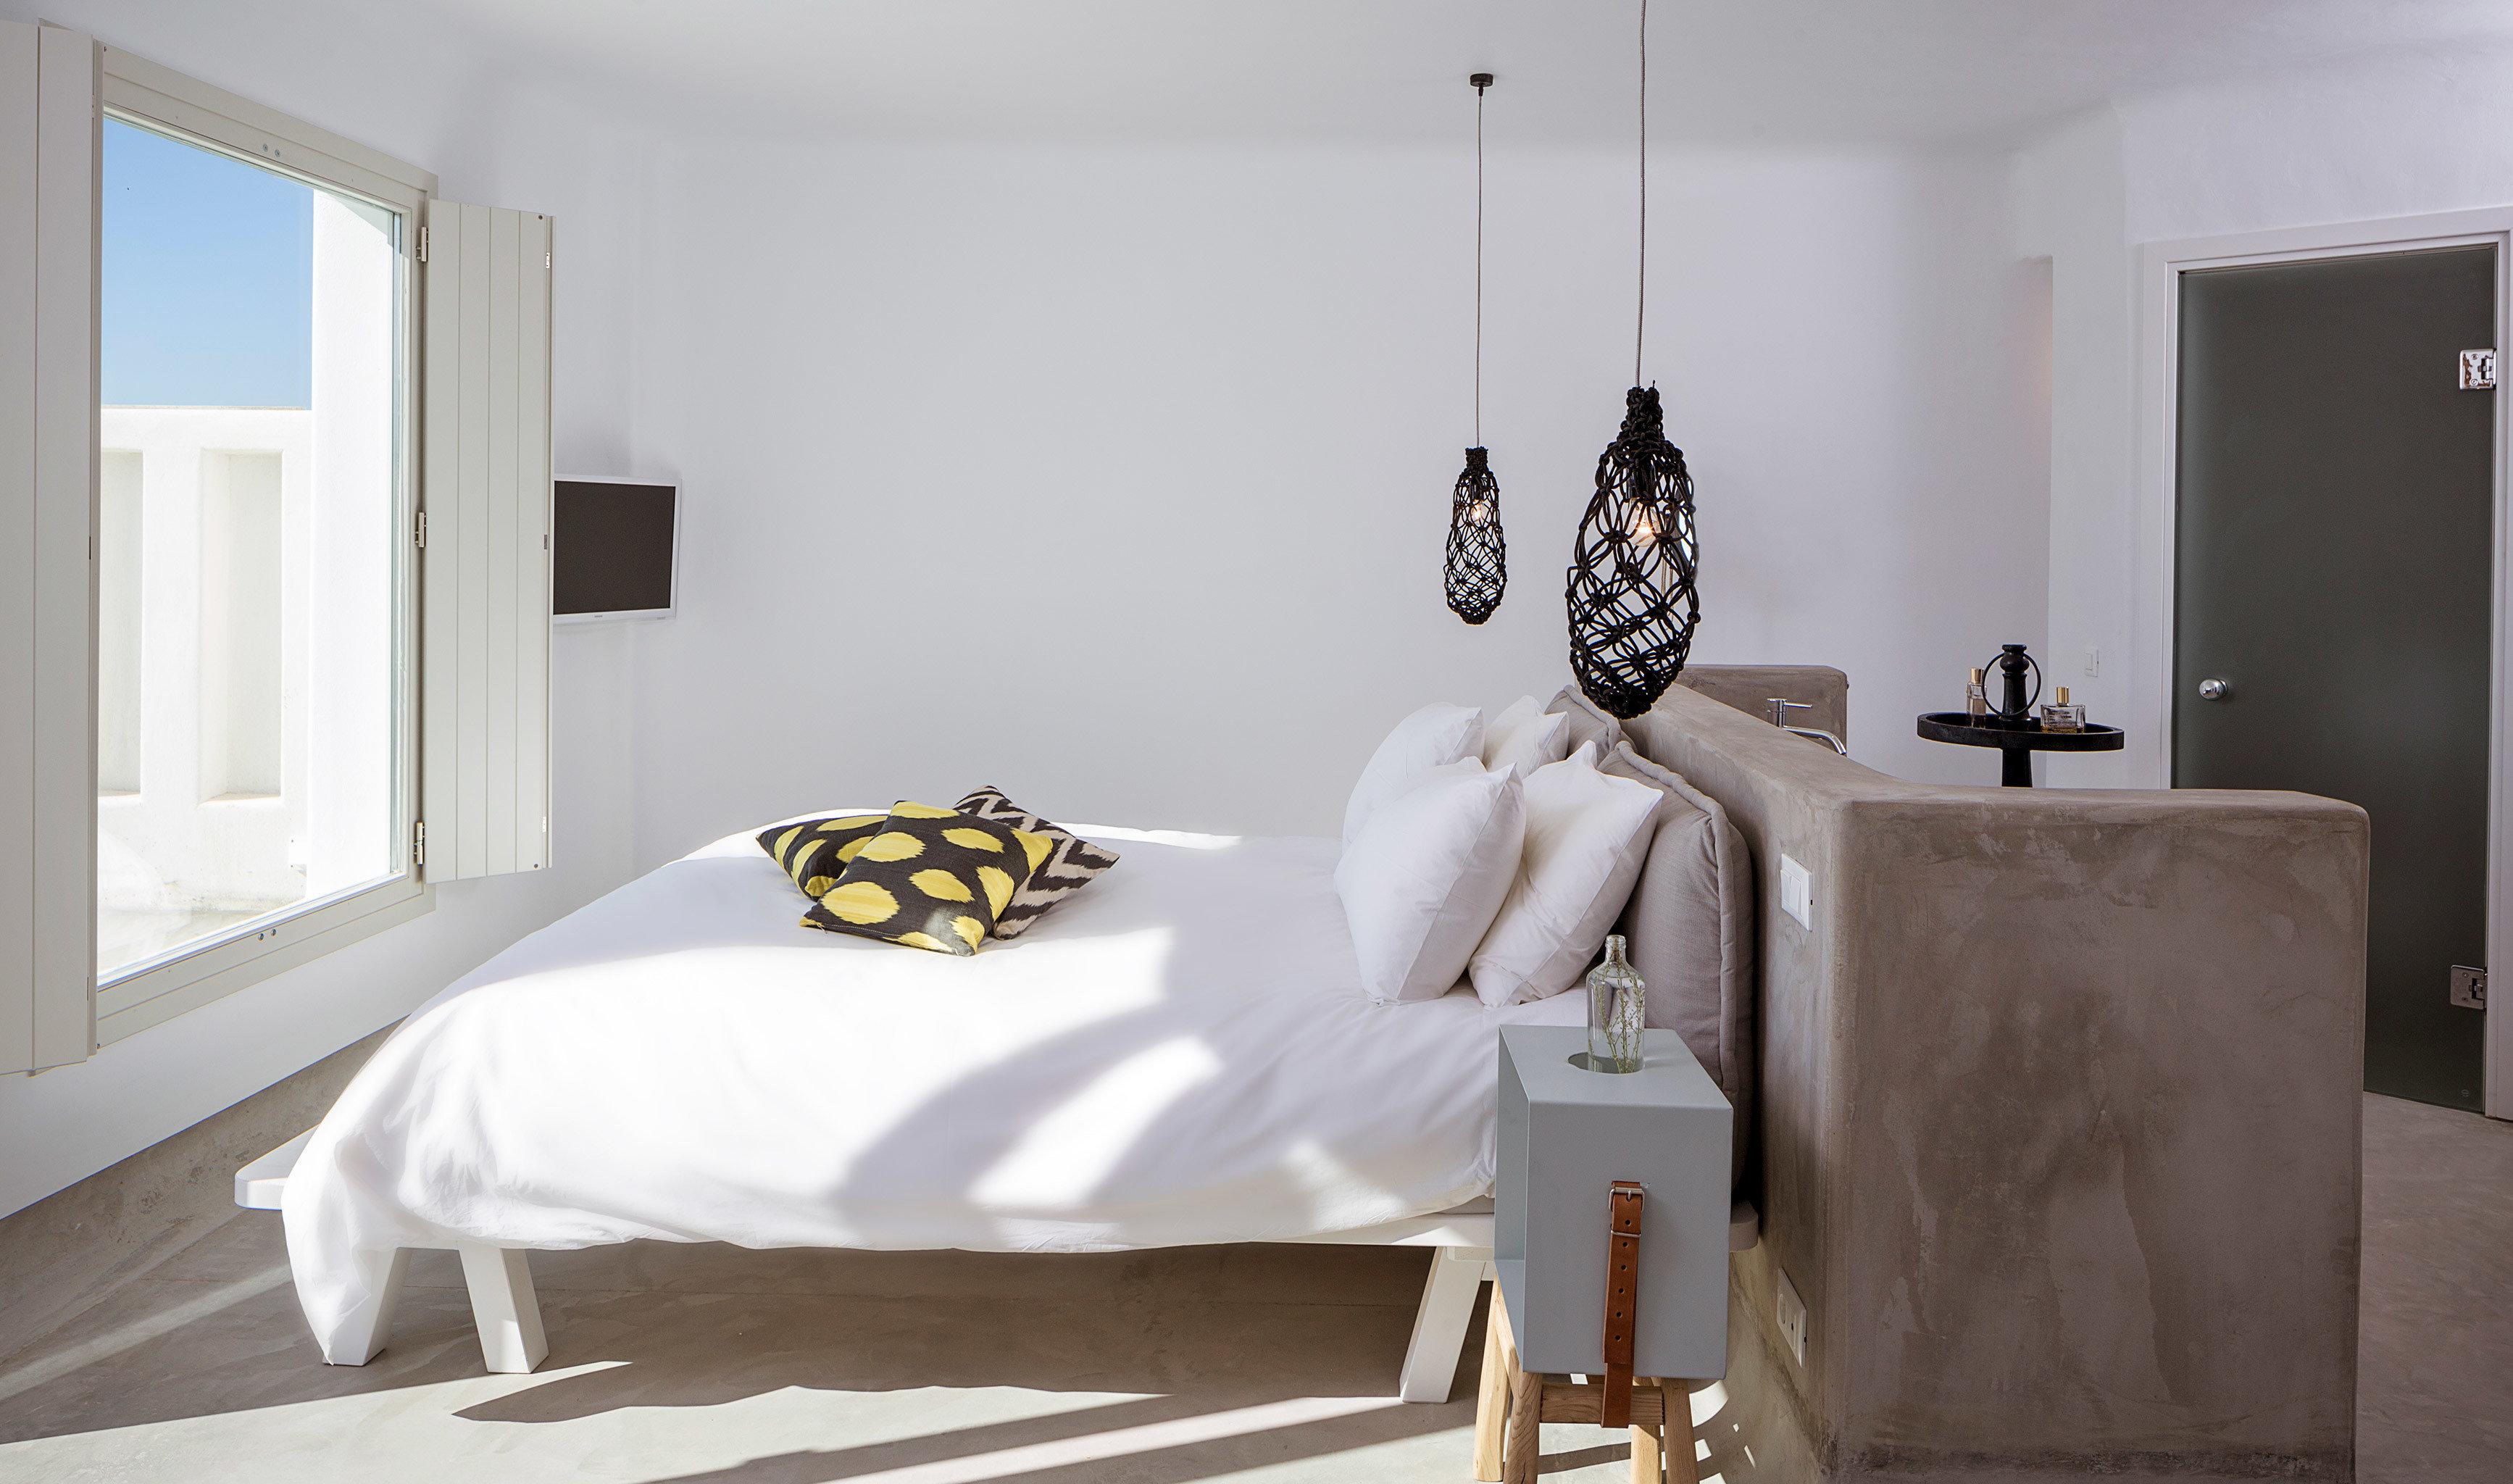 Beachfront Bedroom Hotels Luxury Luxury Travel Modern Ocean Romantic Scenic views Suite Trip Ideas white property home living room